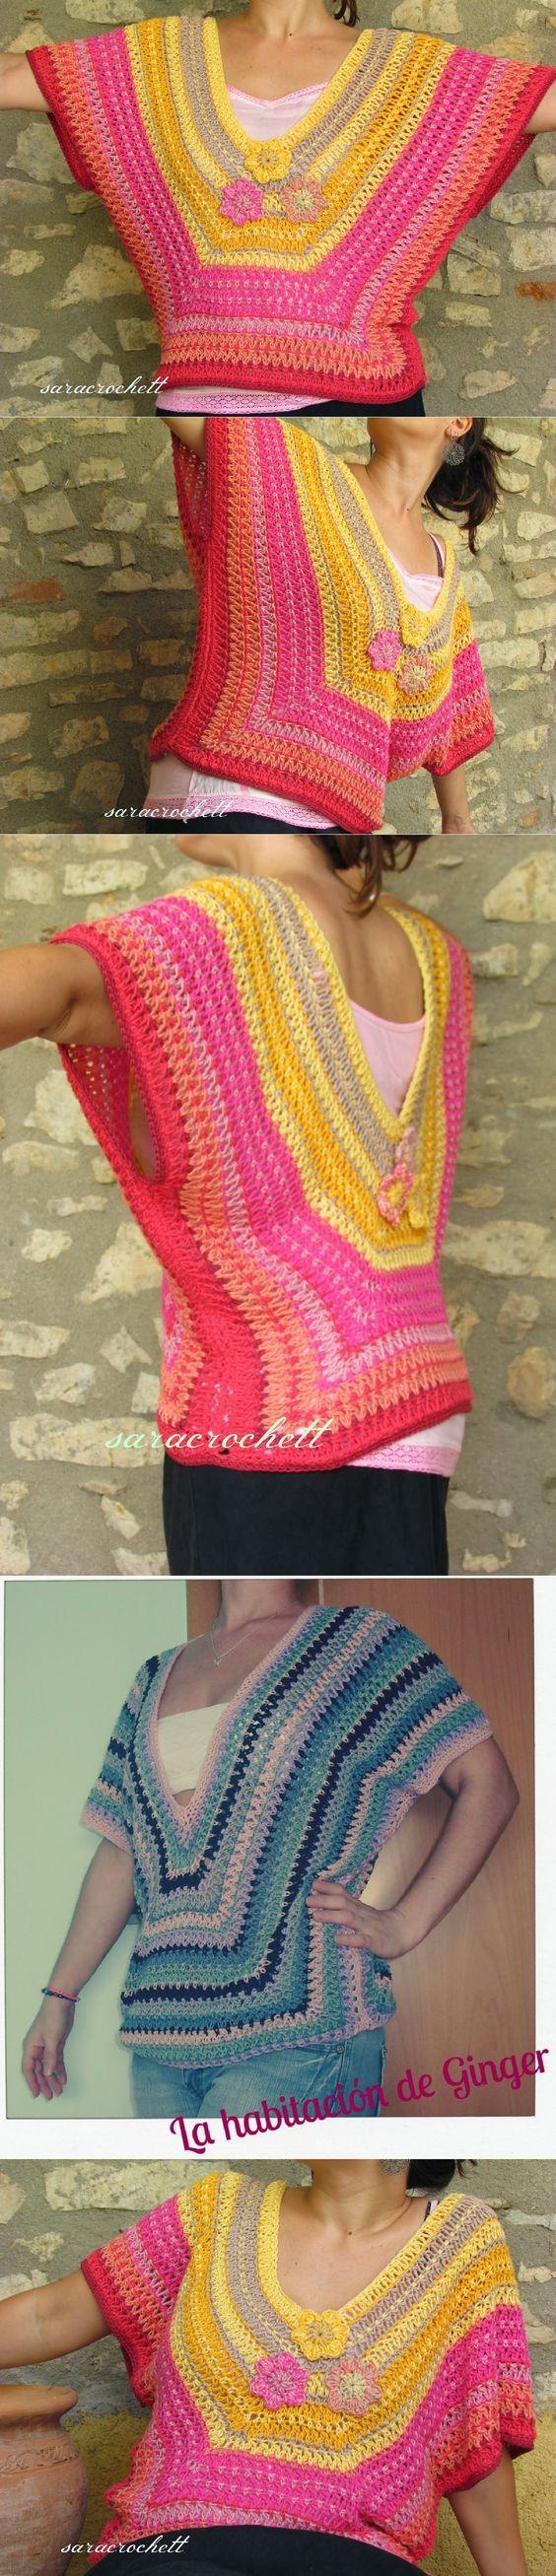 Granny-Poncho for Summer (spanish pattern)